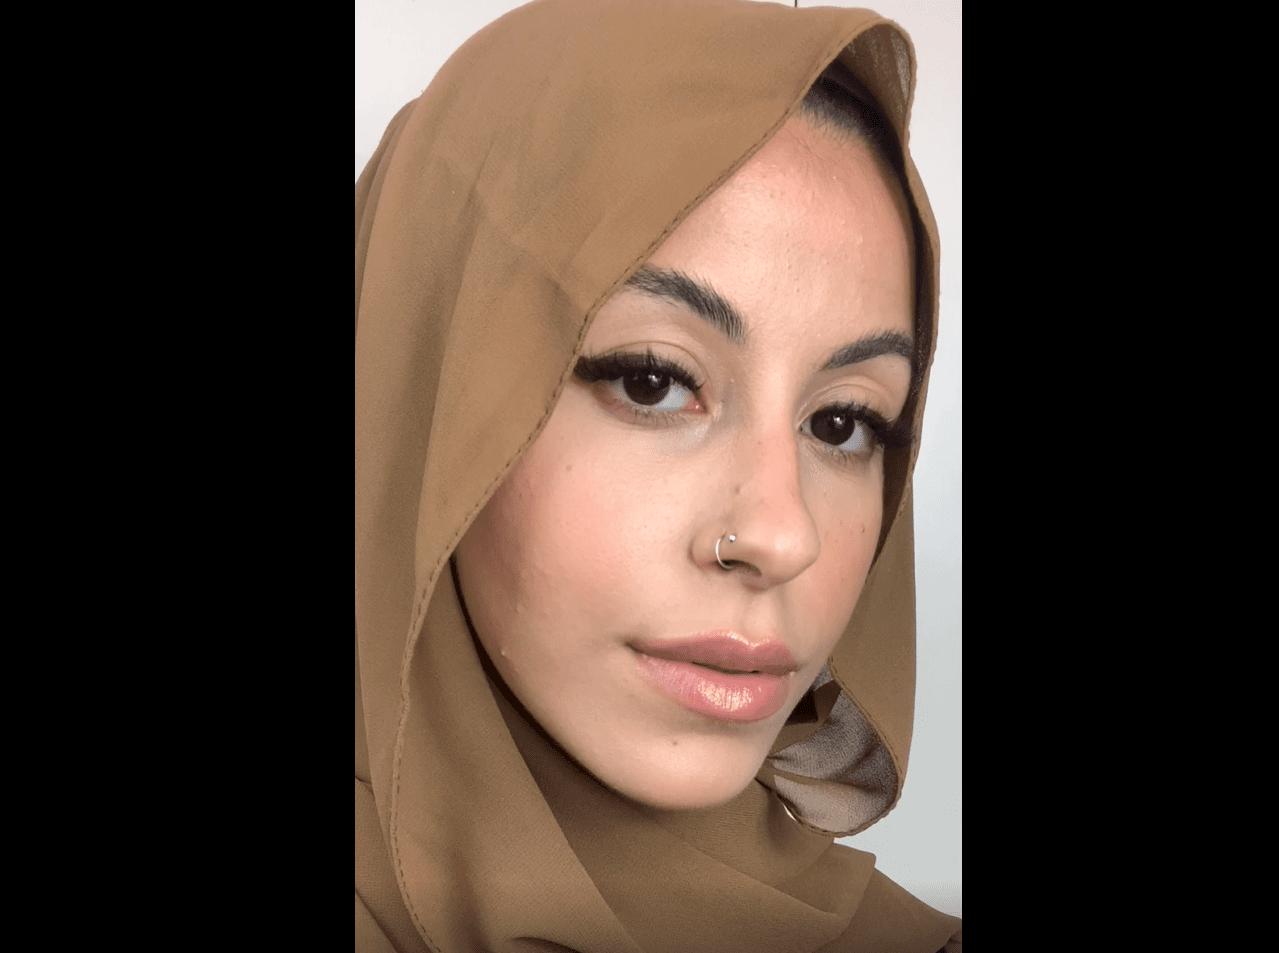 Back to school Make up con la nostra influencer Esraa!